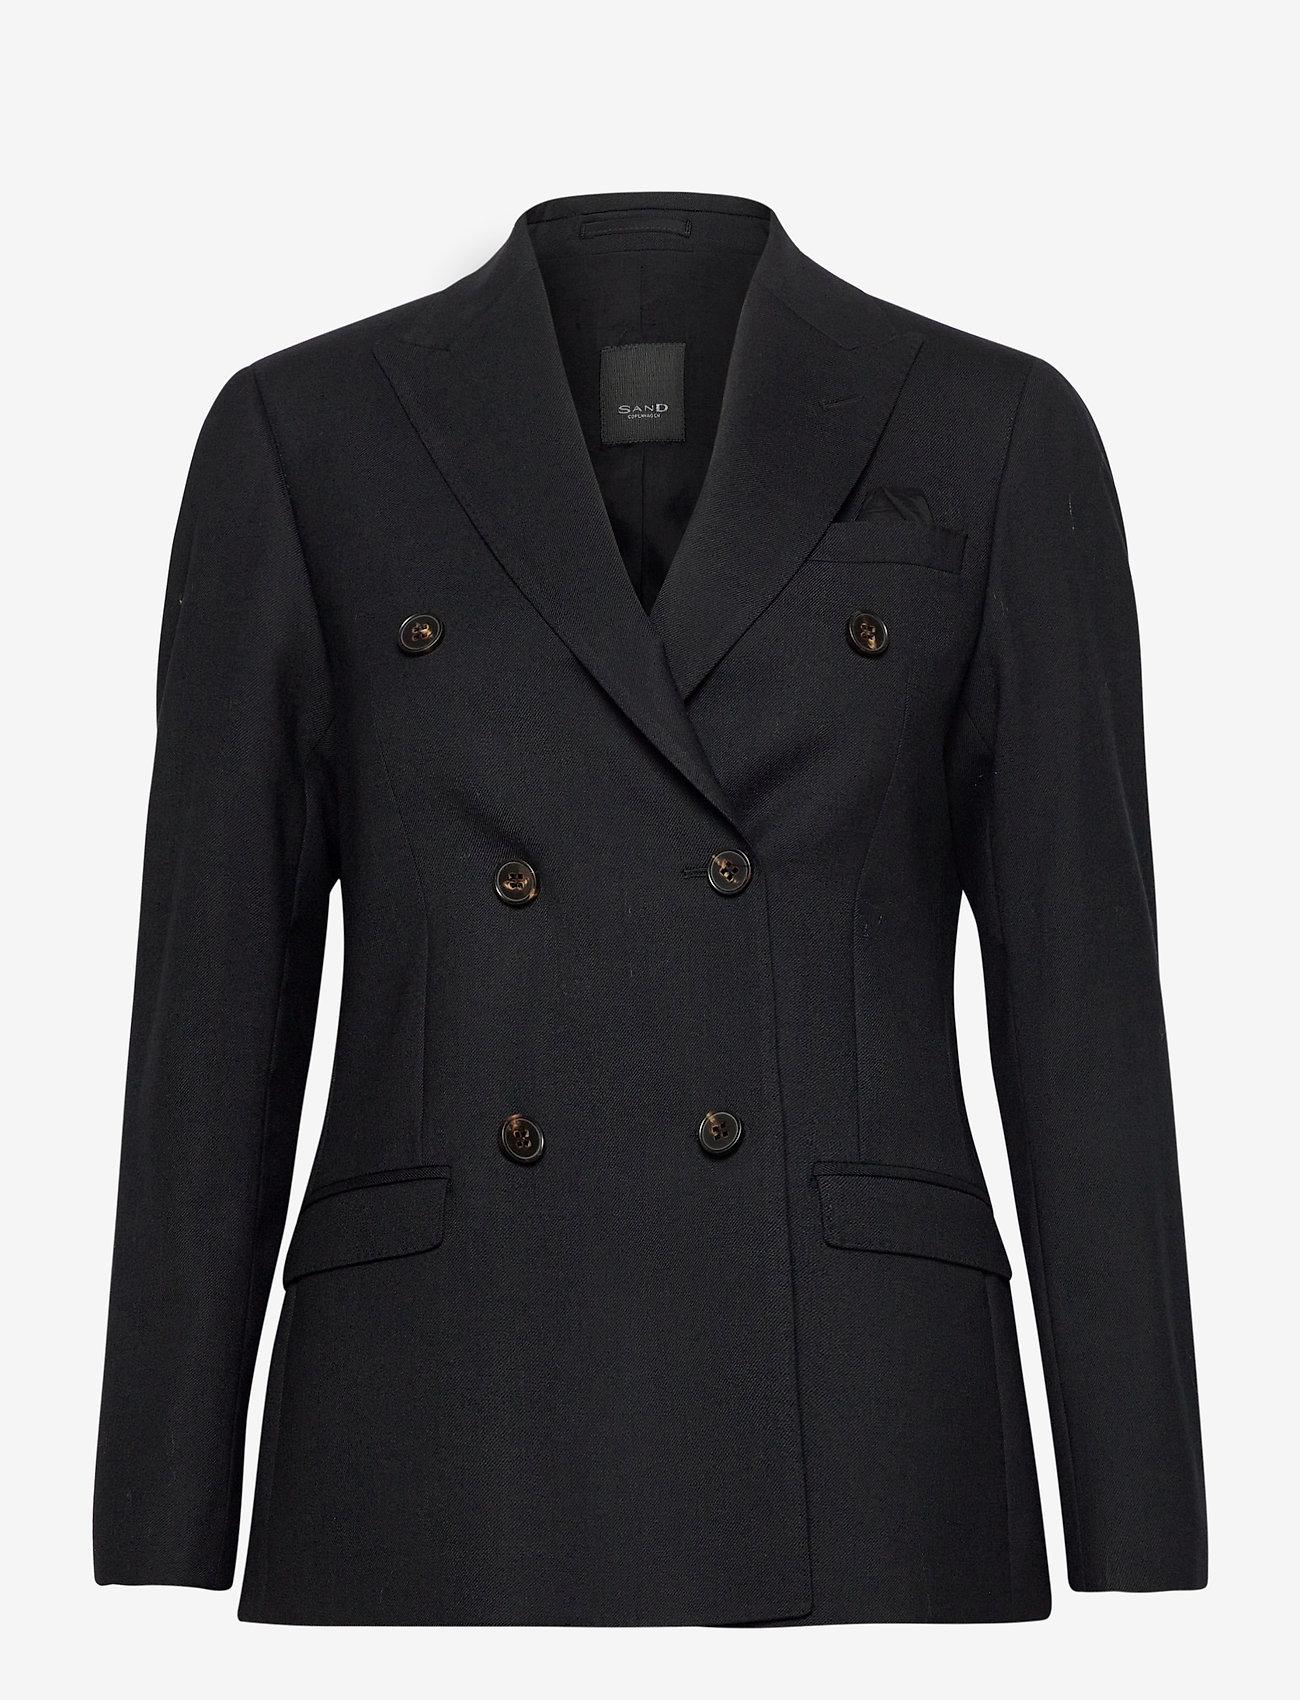 SAND - 2558 - Rani DB - getailleerde blazers - black - 0